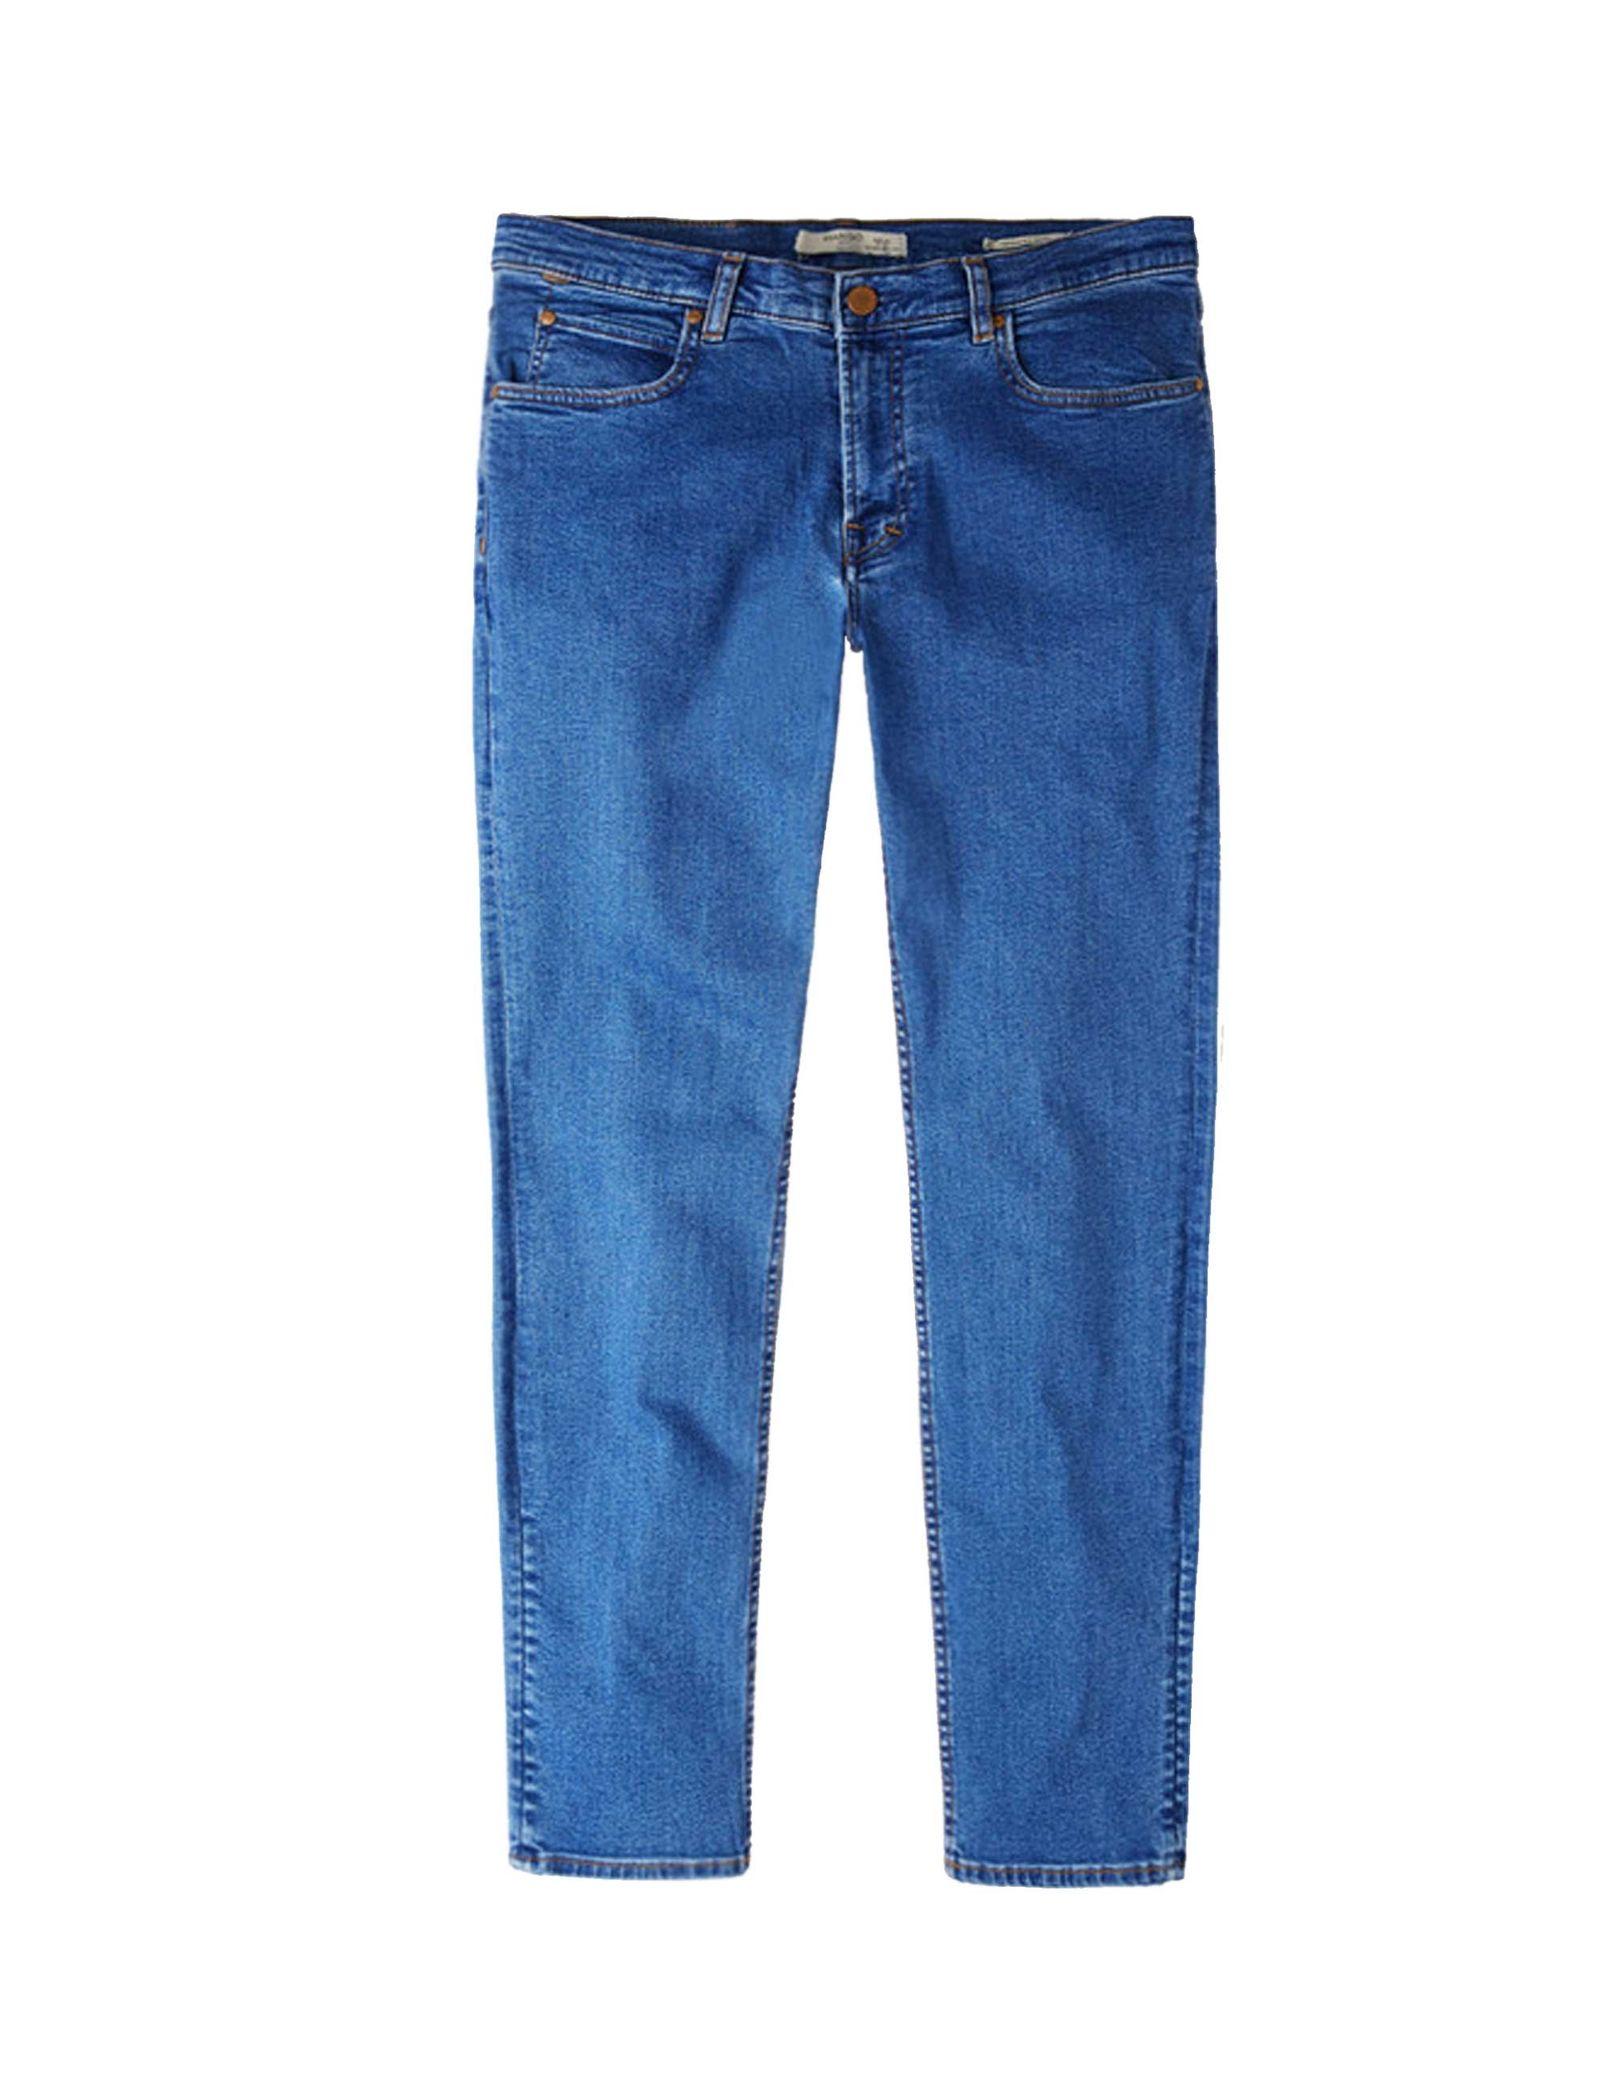 شلوار جین جذب مردانه - مانگو - آبي - 1